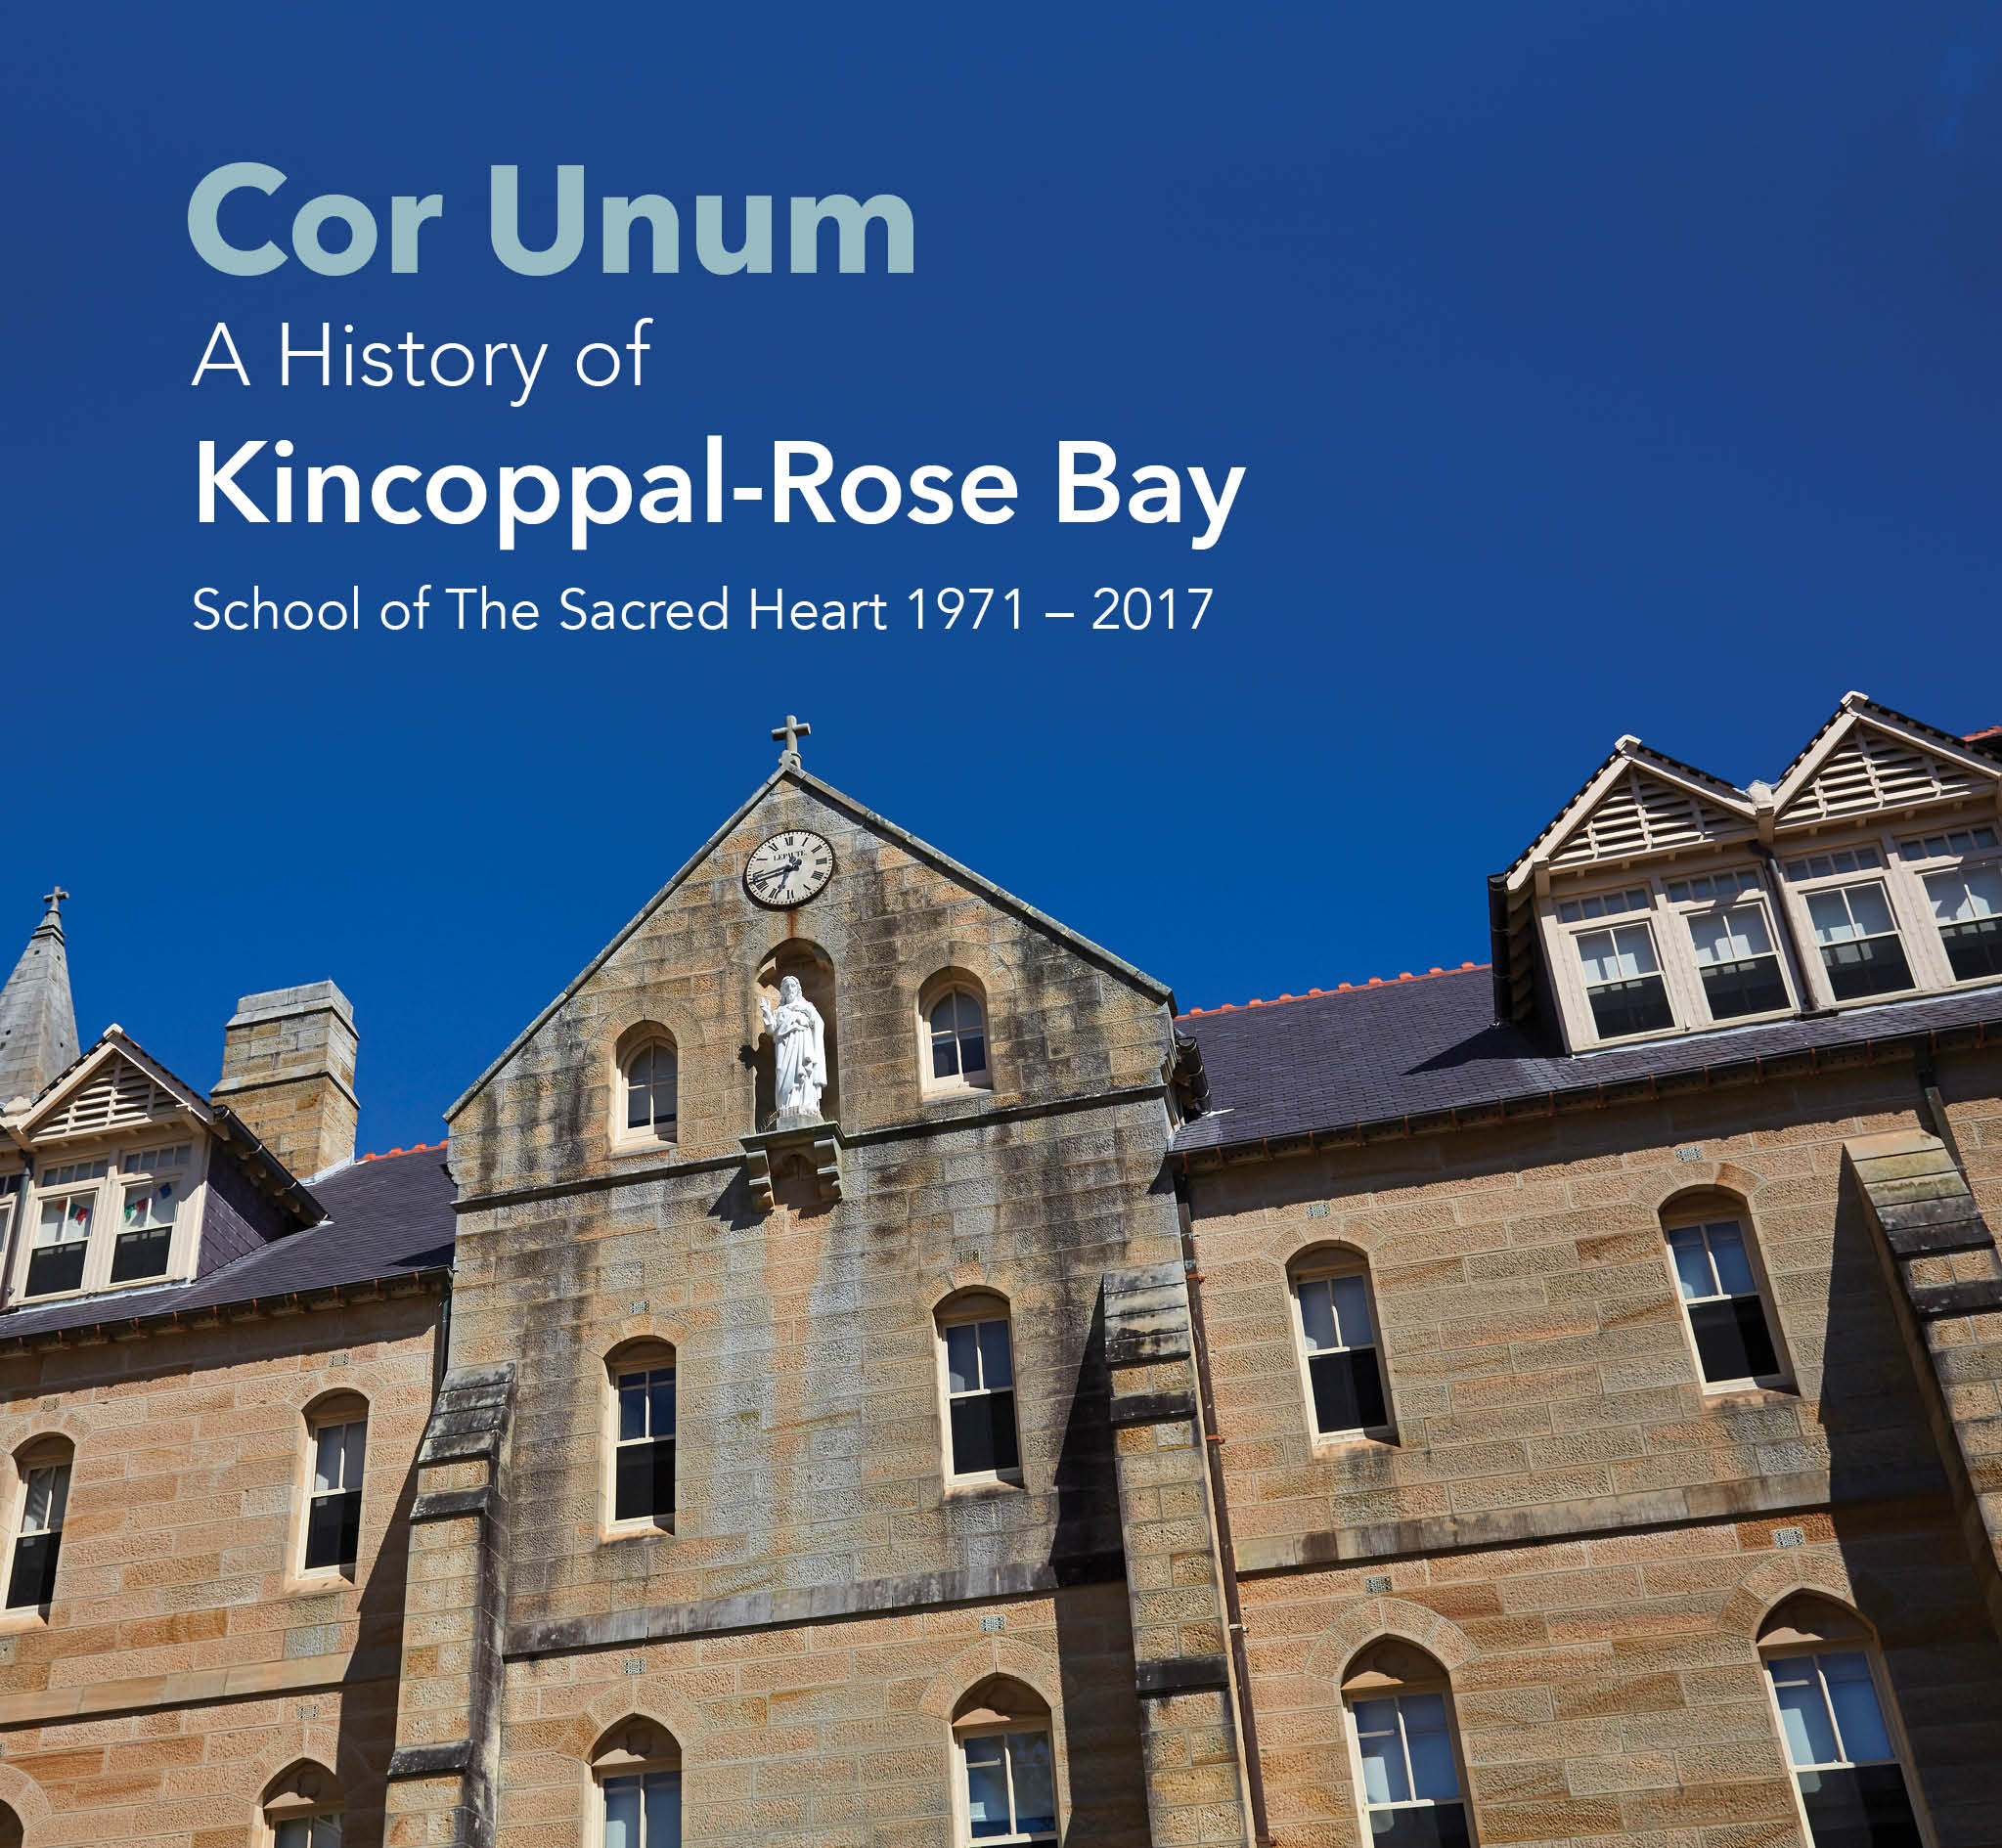 Commemorative Kincoppal Rose Bay School